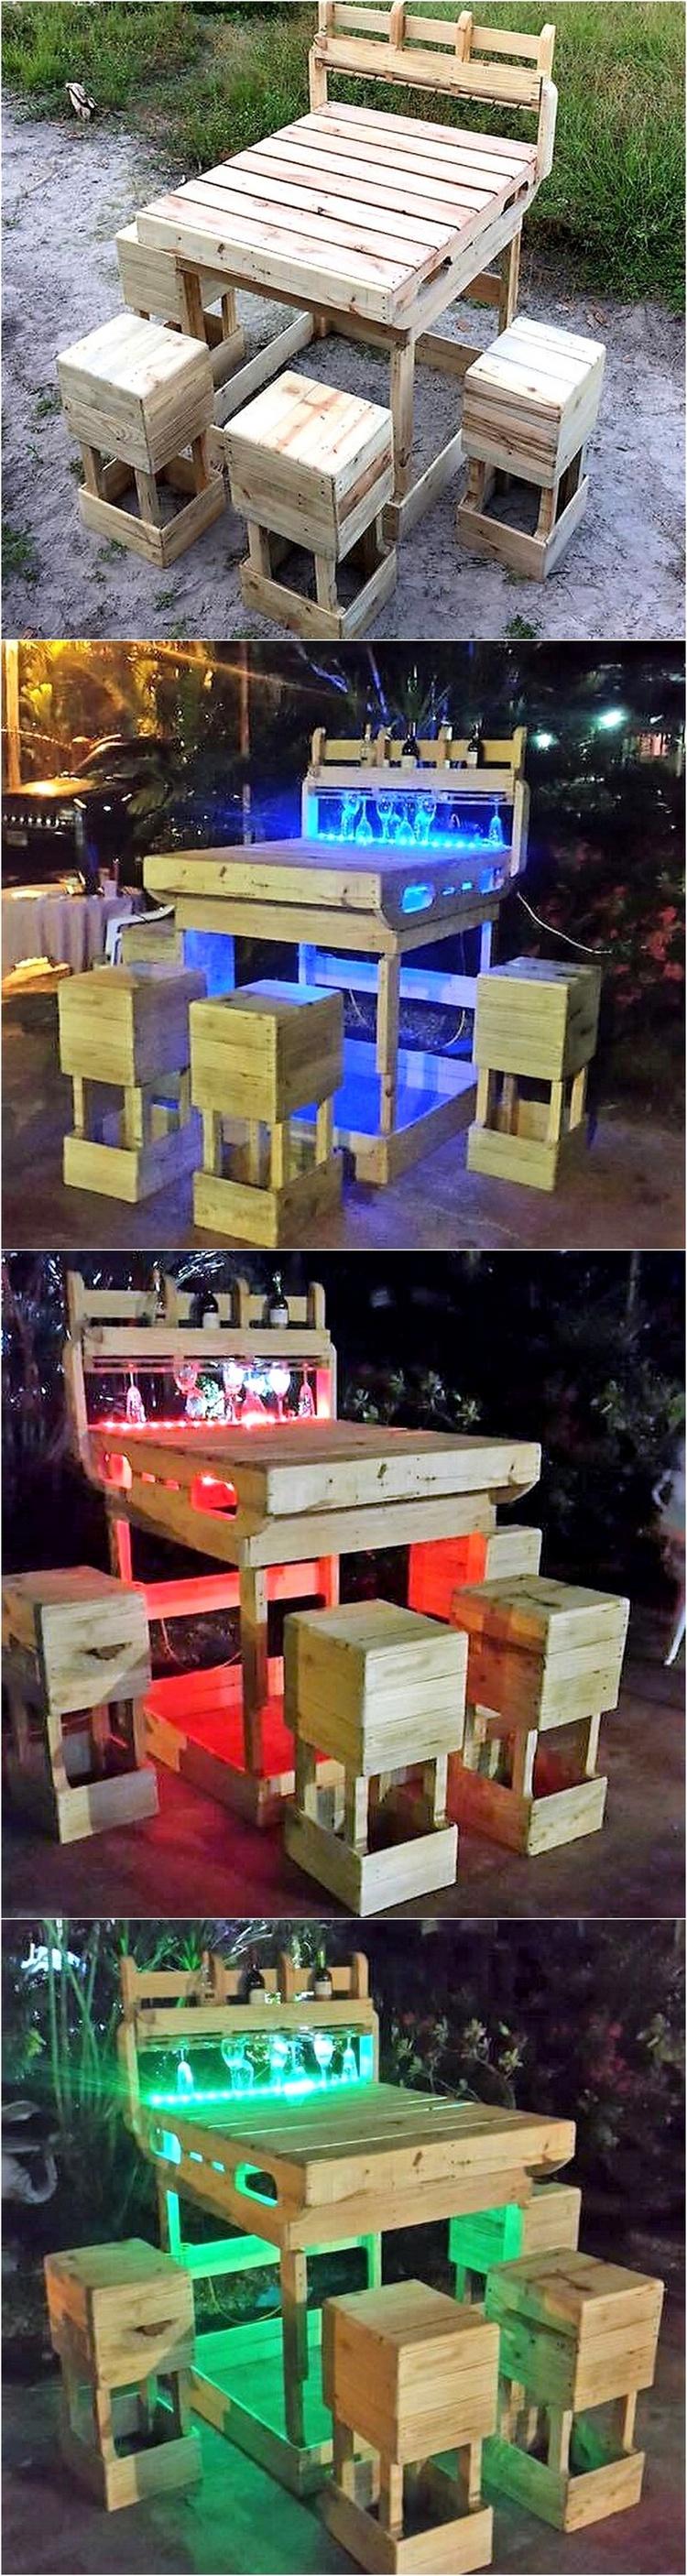 2 - pallet patio bar plan